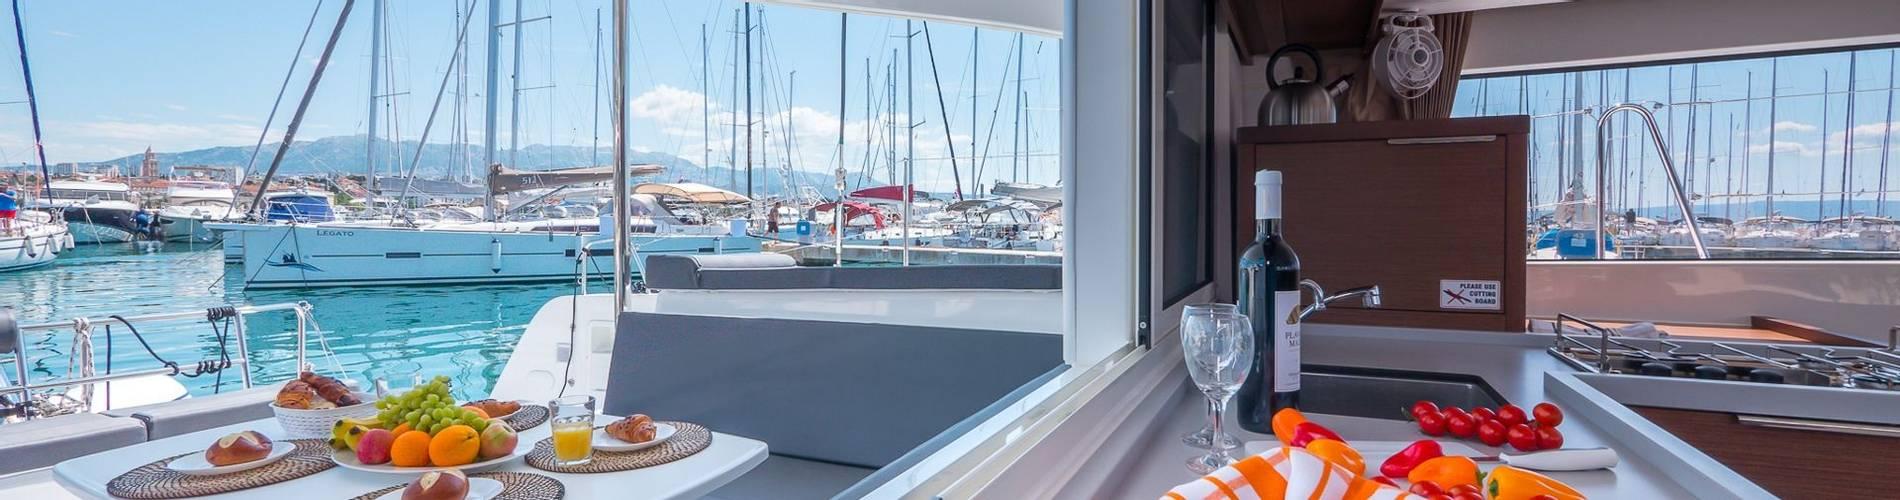 catamaran cruise 5.jpg